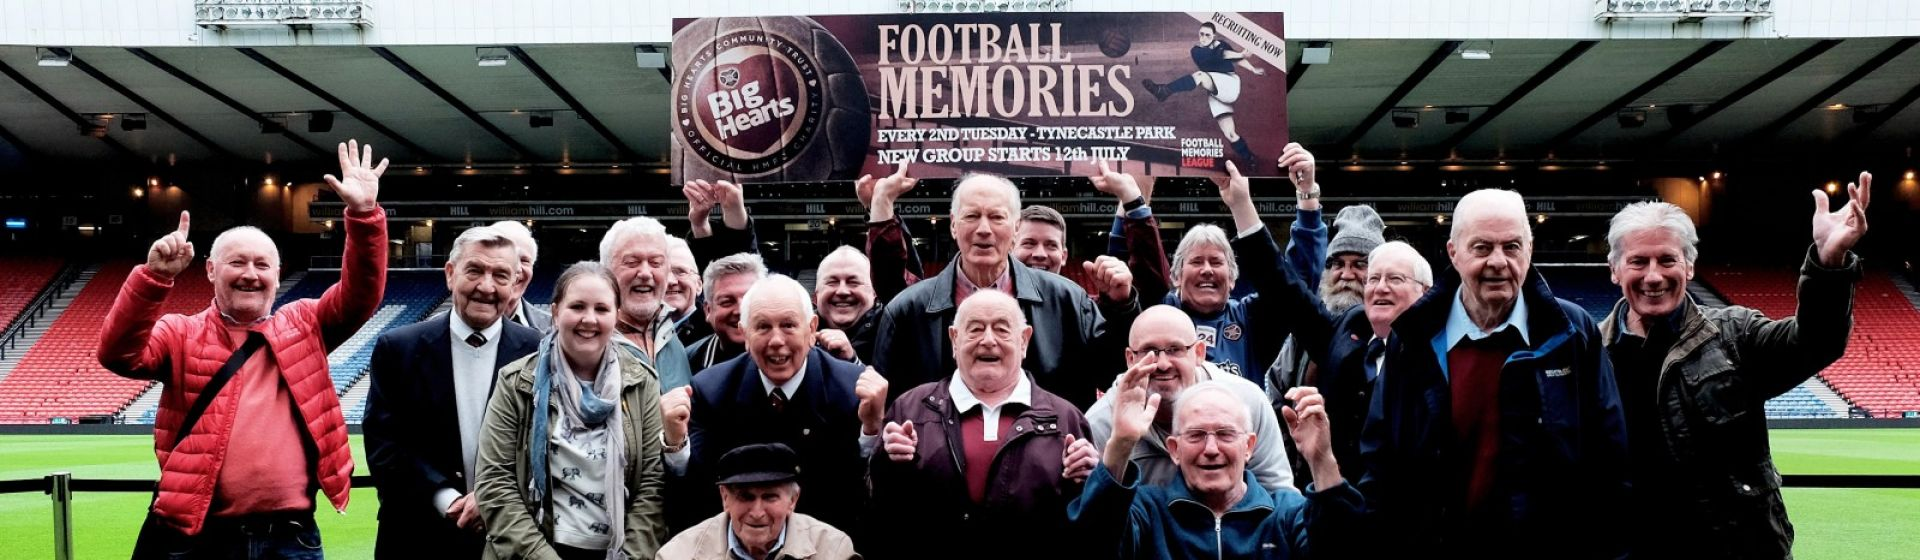 Hearts FC - Football Memories